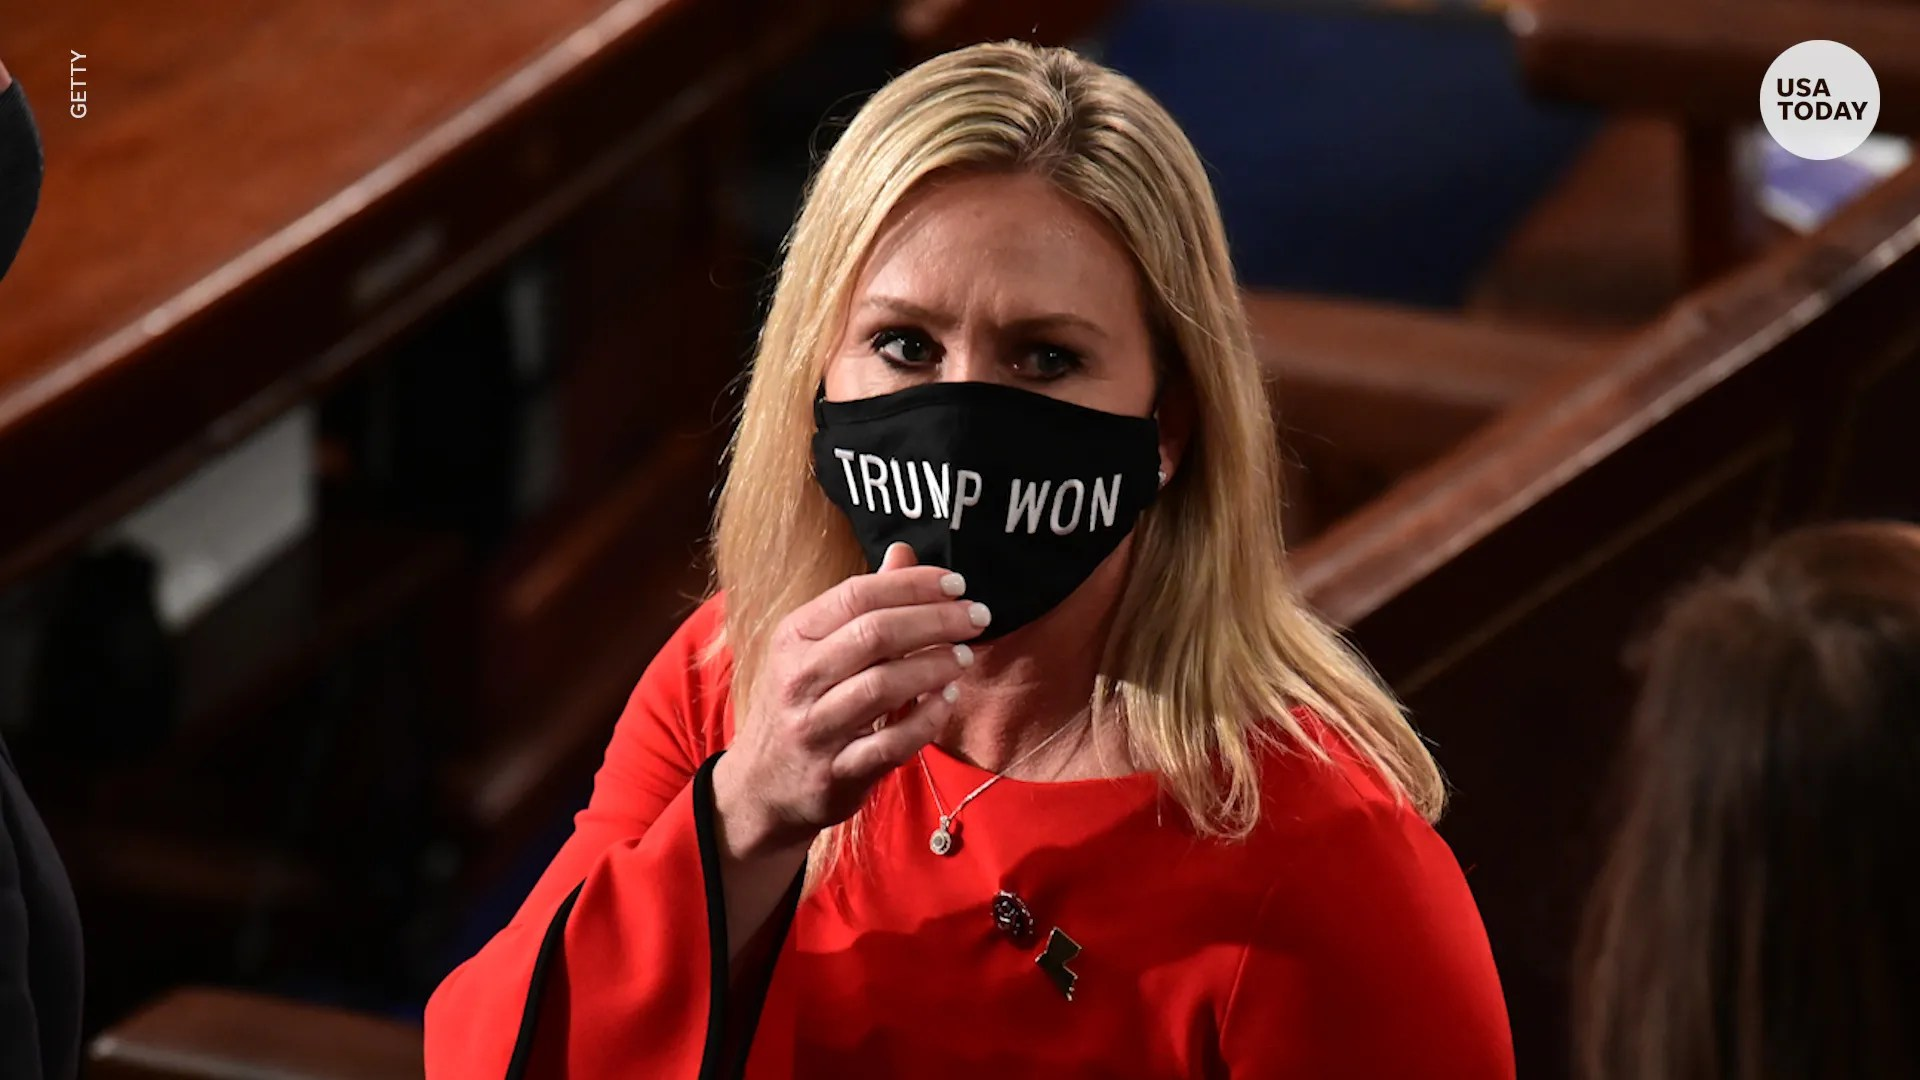 84c08920 0f1e 4dde 9196 b09c2a150220 VPC MARJORIE TAYLOR GREENE PARKLAND VIDEO DESK THUMB Politics live updates: Cheney keeps job as chair of House GOP Conference despite impeachment vote